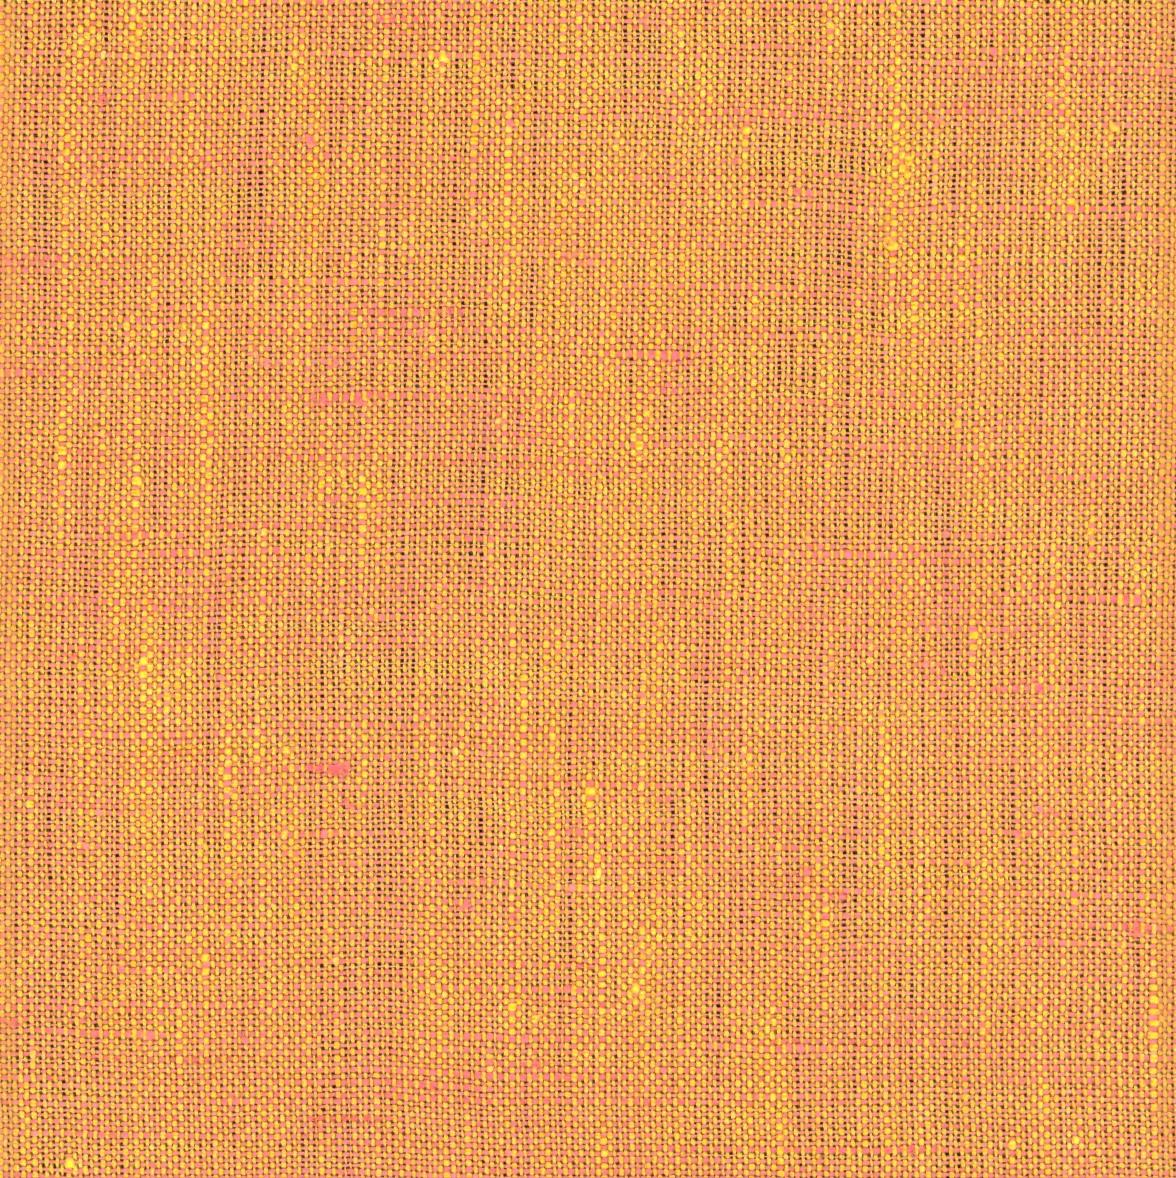 CERRO Yellow/Pink